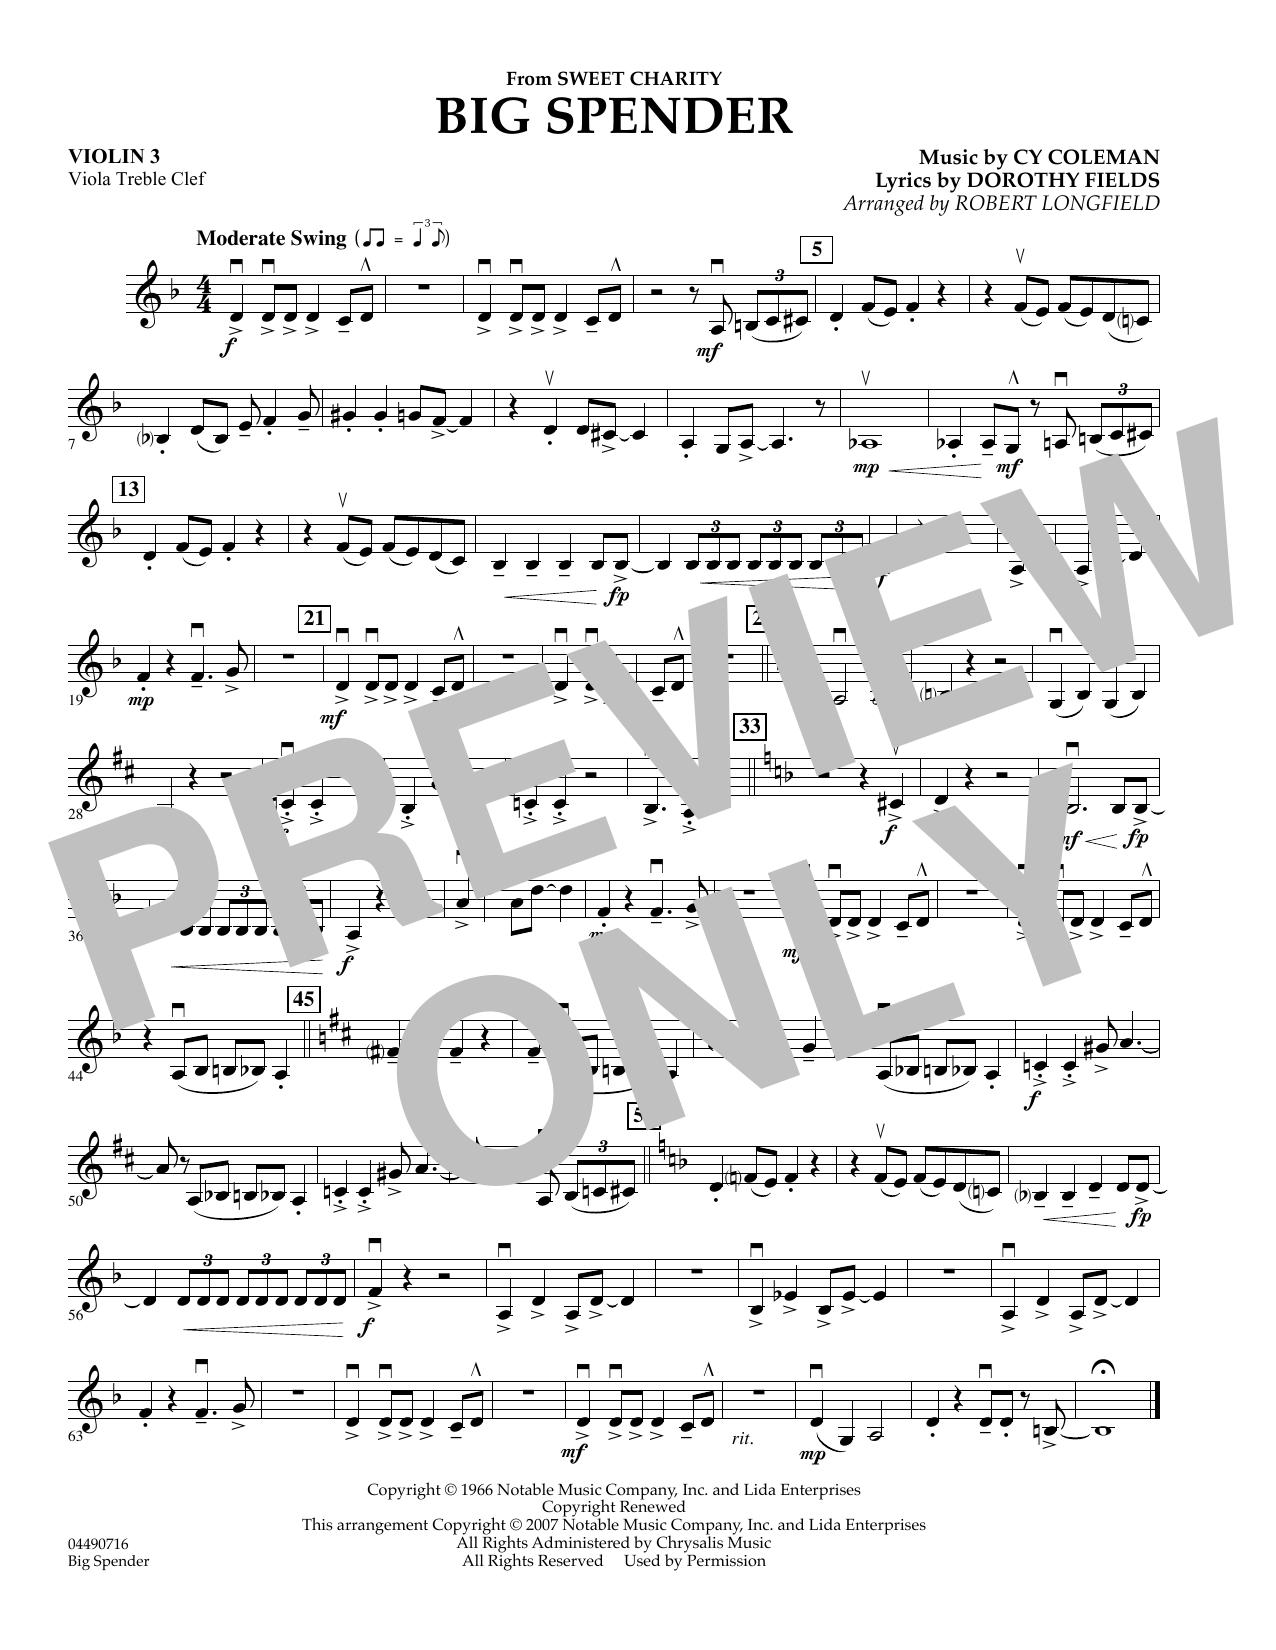 Cy Coleman: Big Spender (Sweet Charity) - Violin 3 (Viola T.C.) (Orchestra)